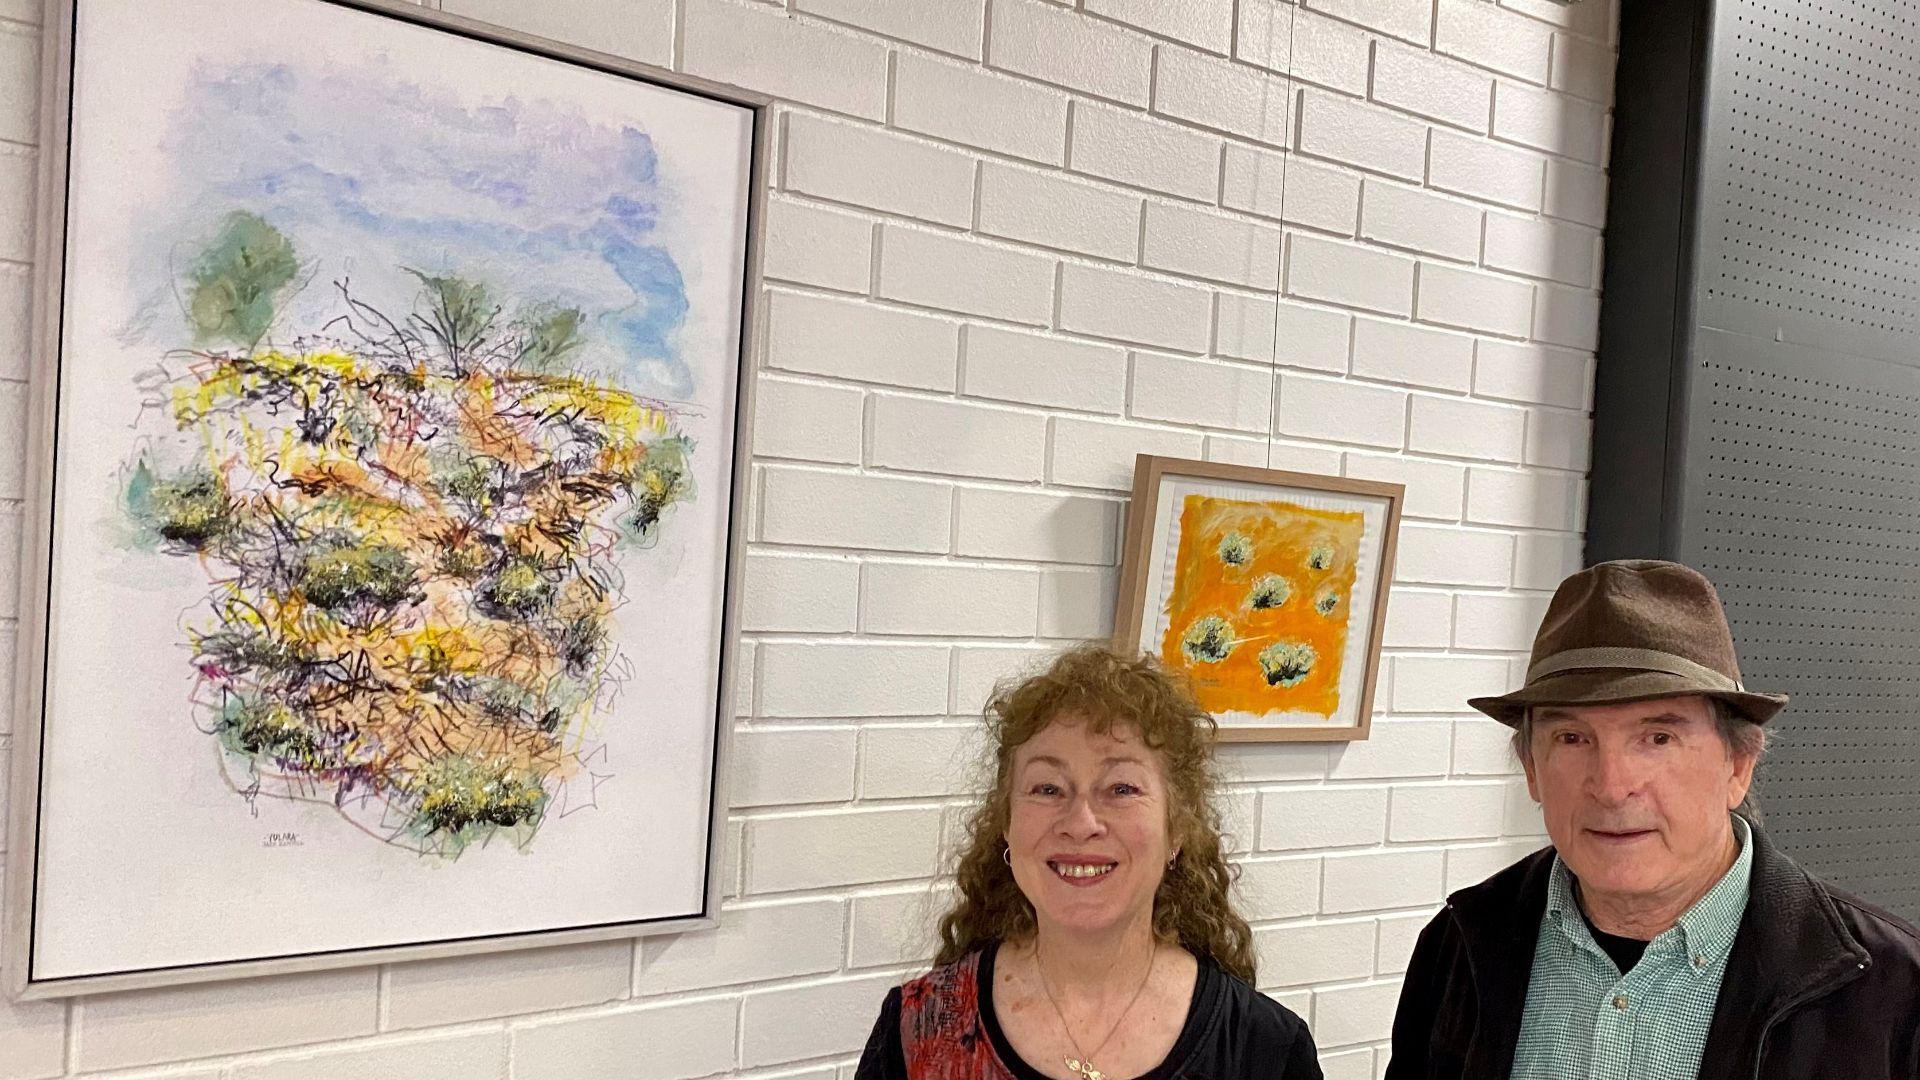 New art exhibition open at Charles Sturt in Dubbo